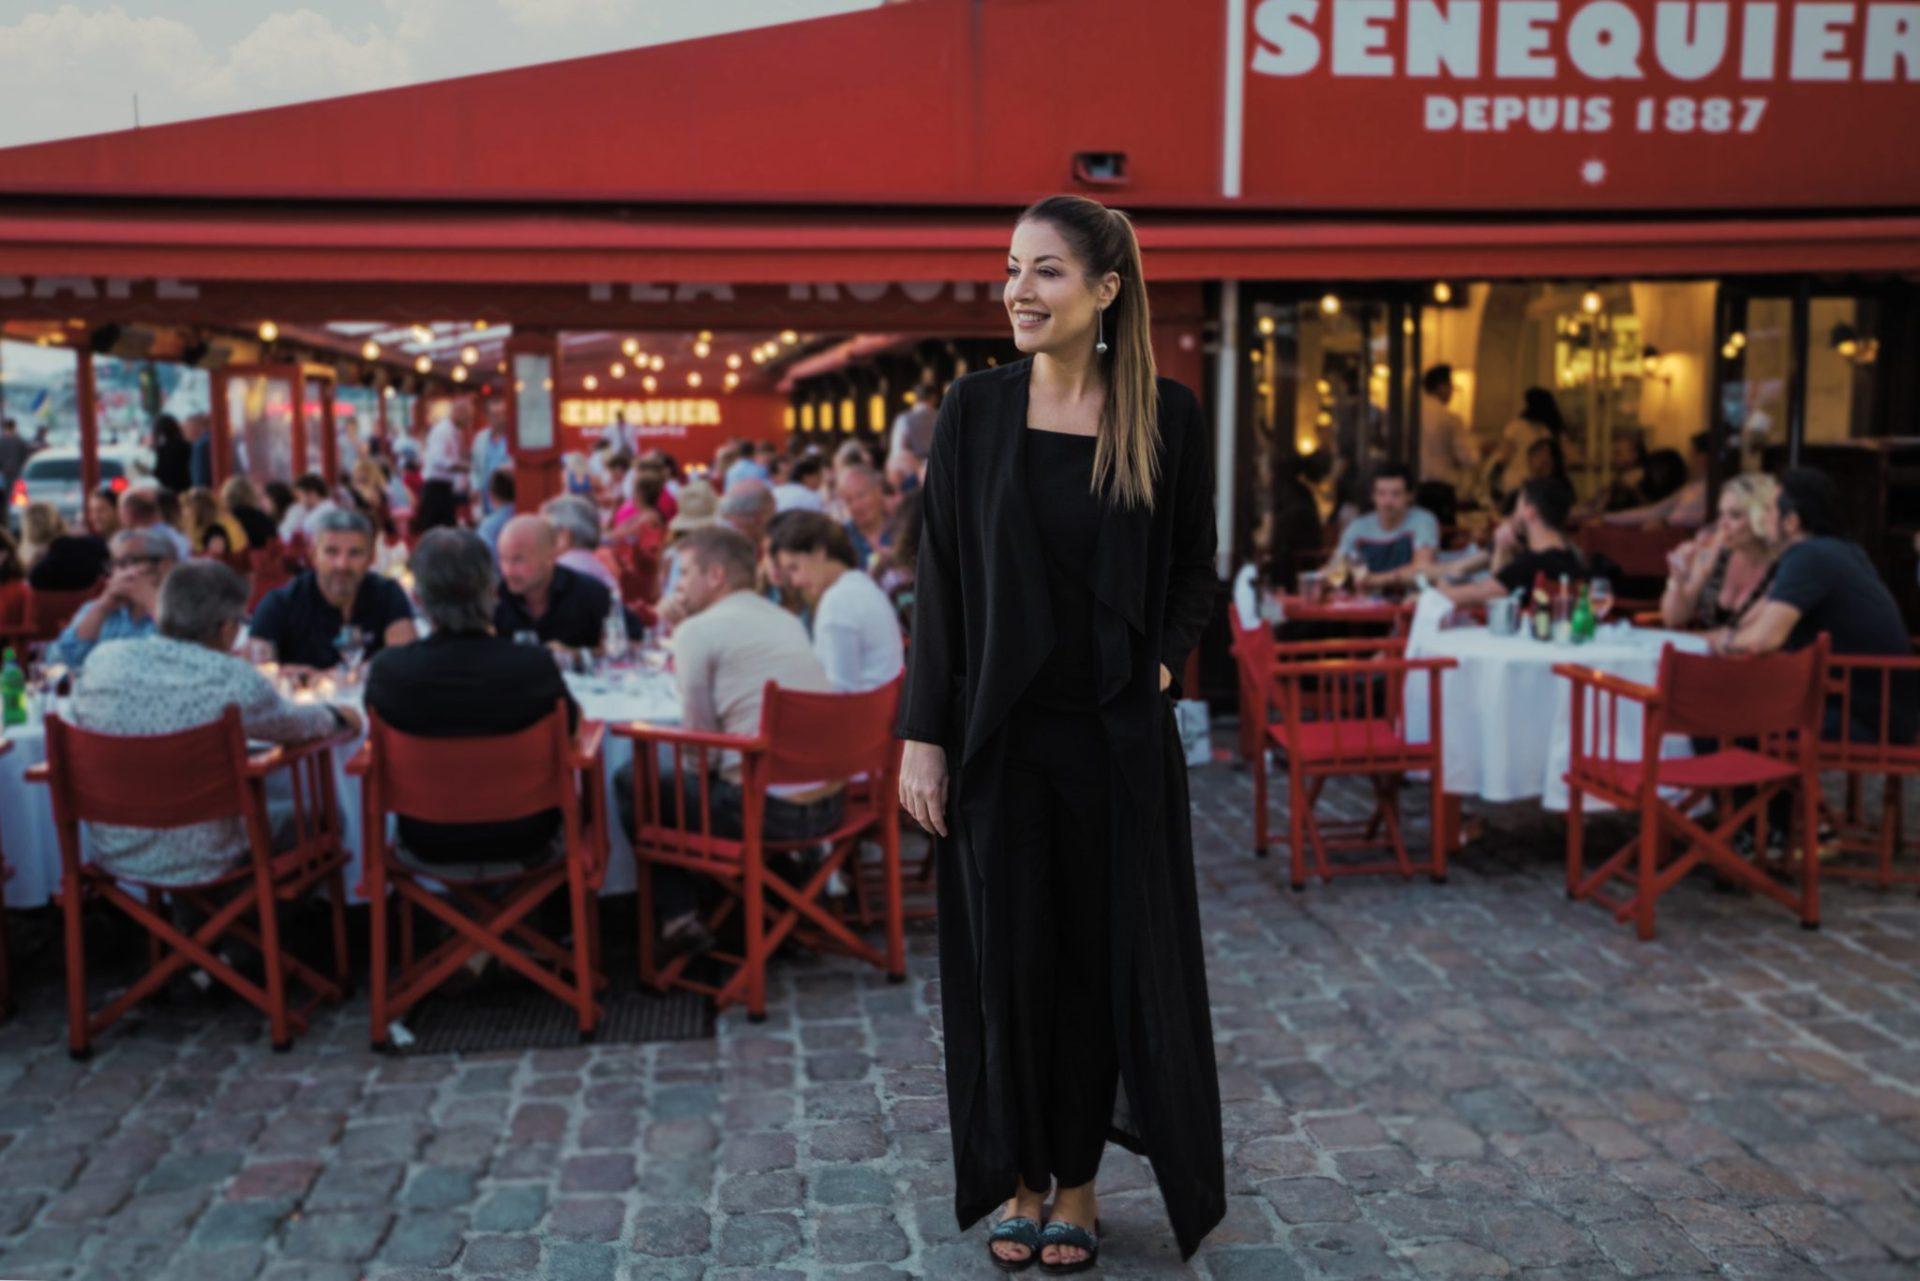 Senequier for restaurants dining St Tropez